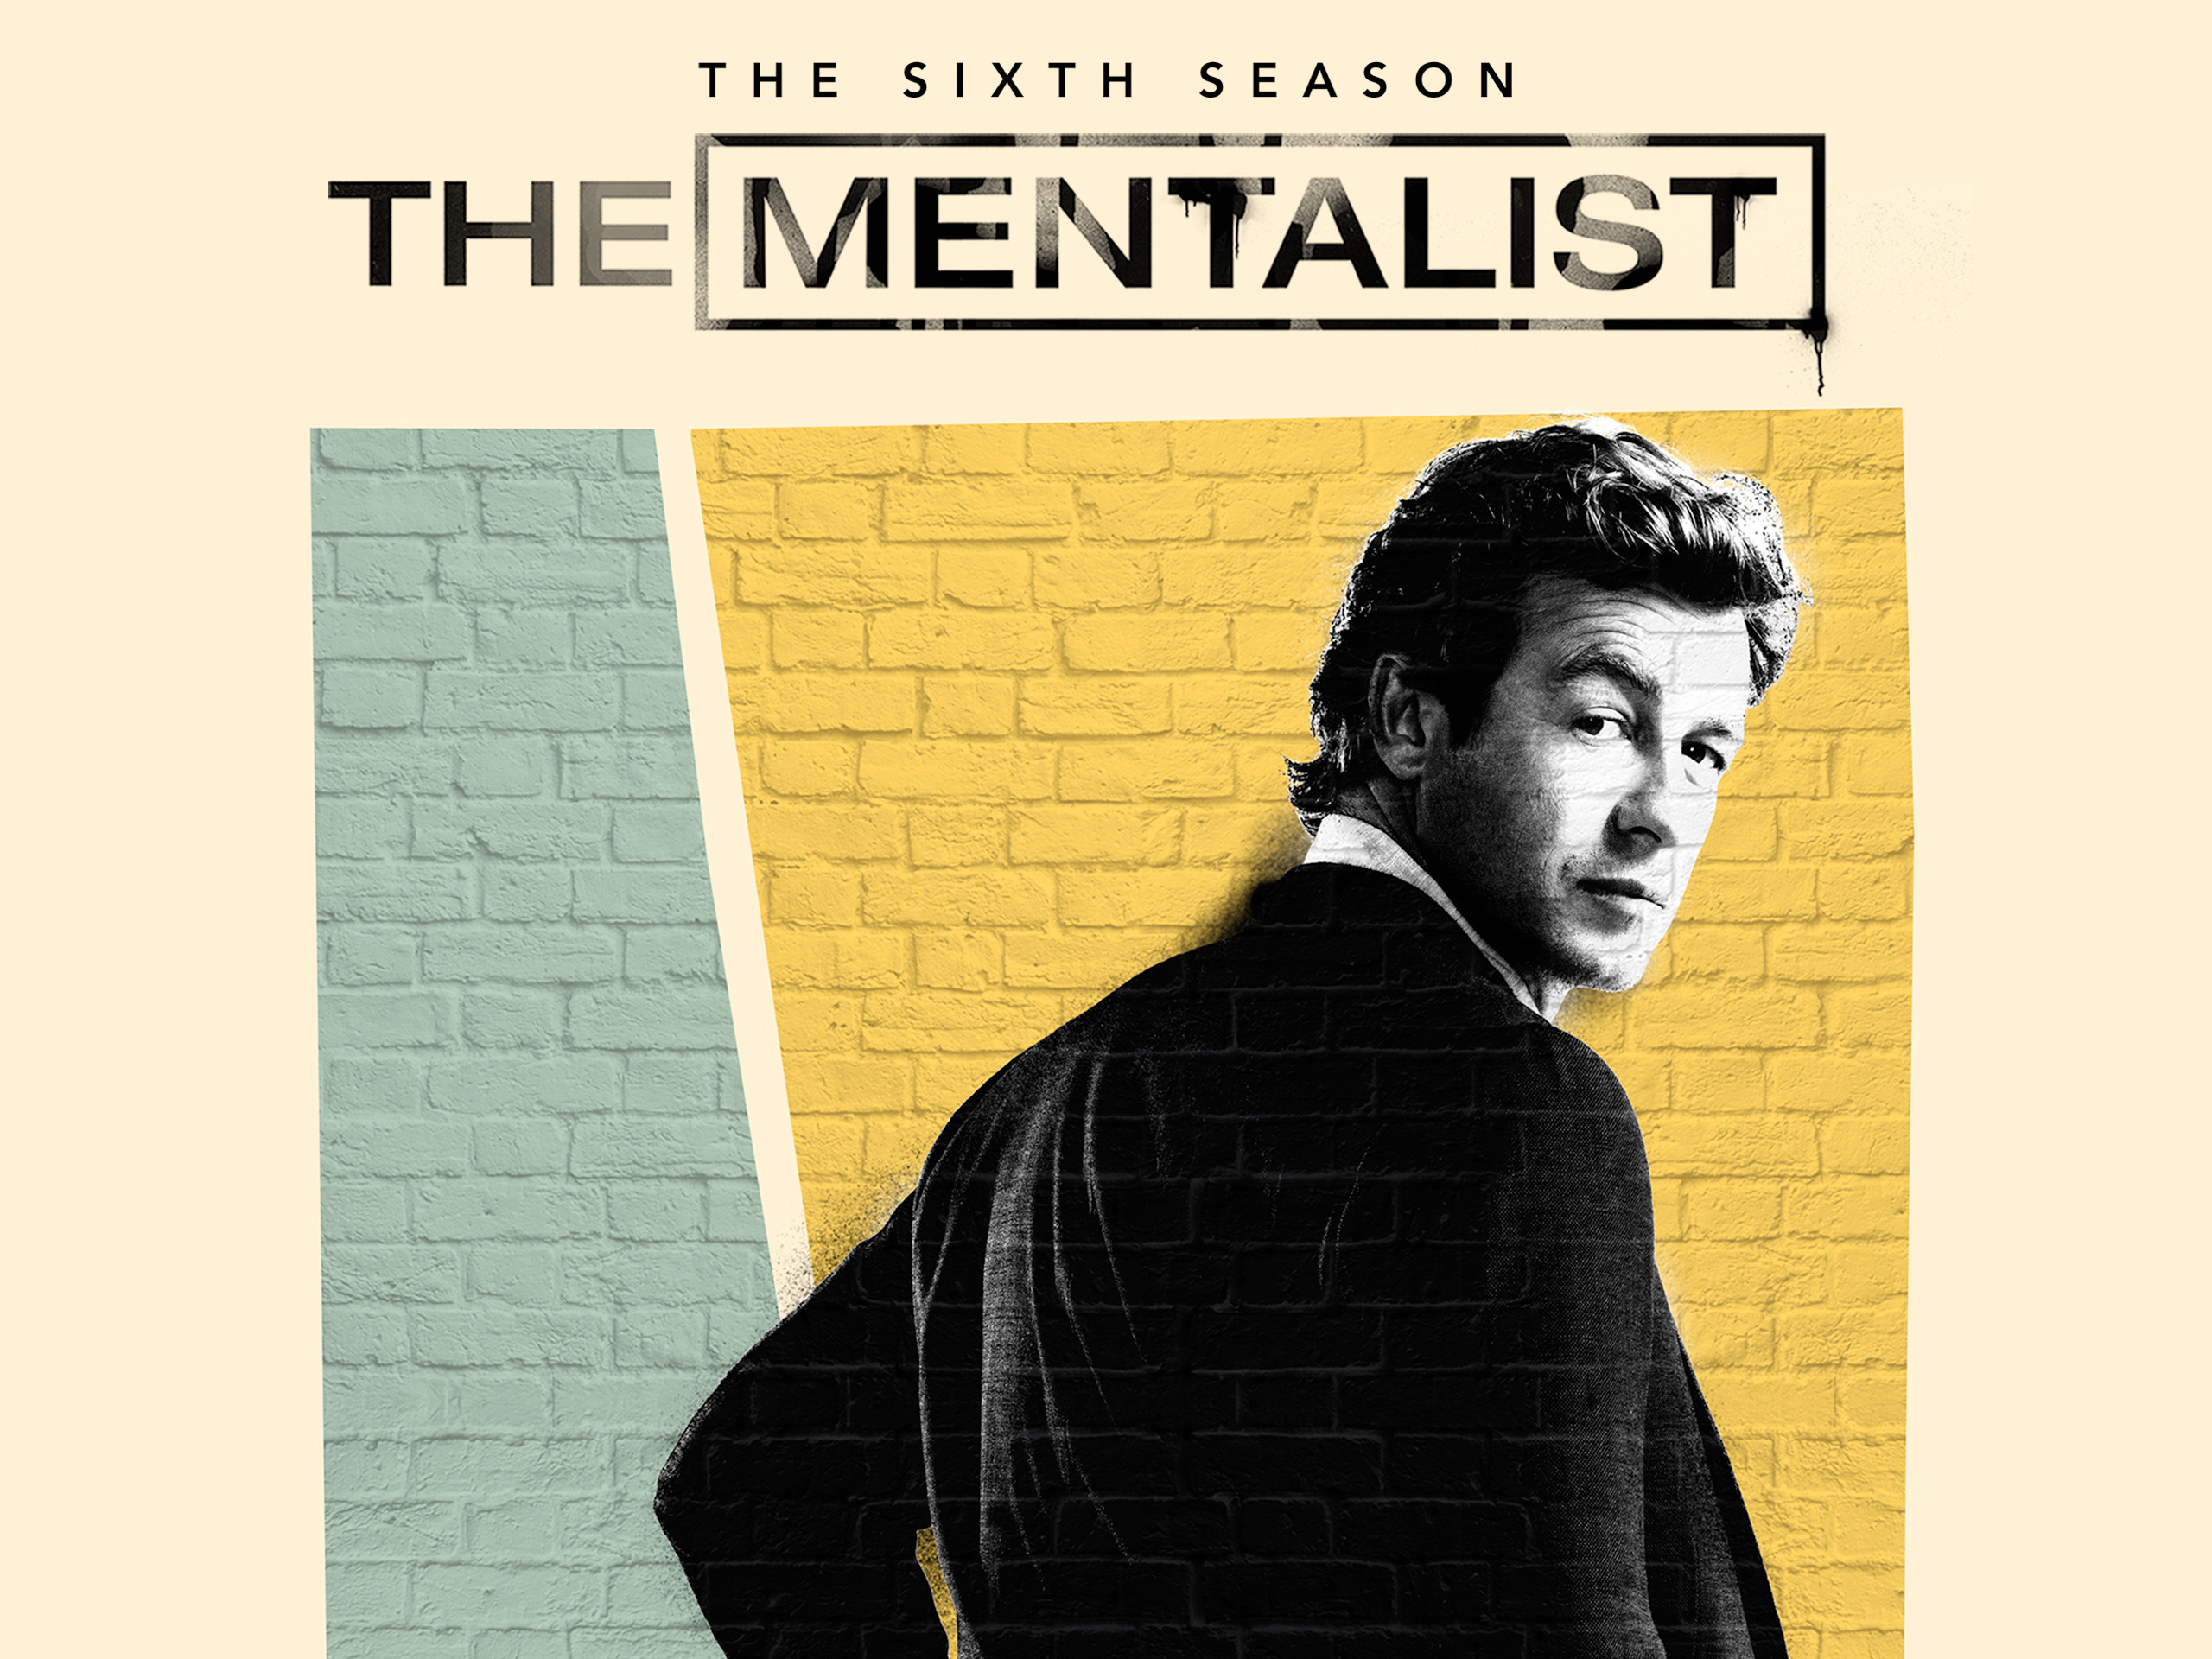 Prime Video: The Mentalist - Season 1